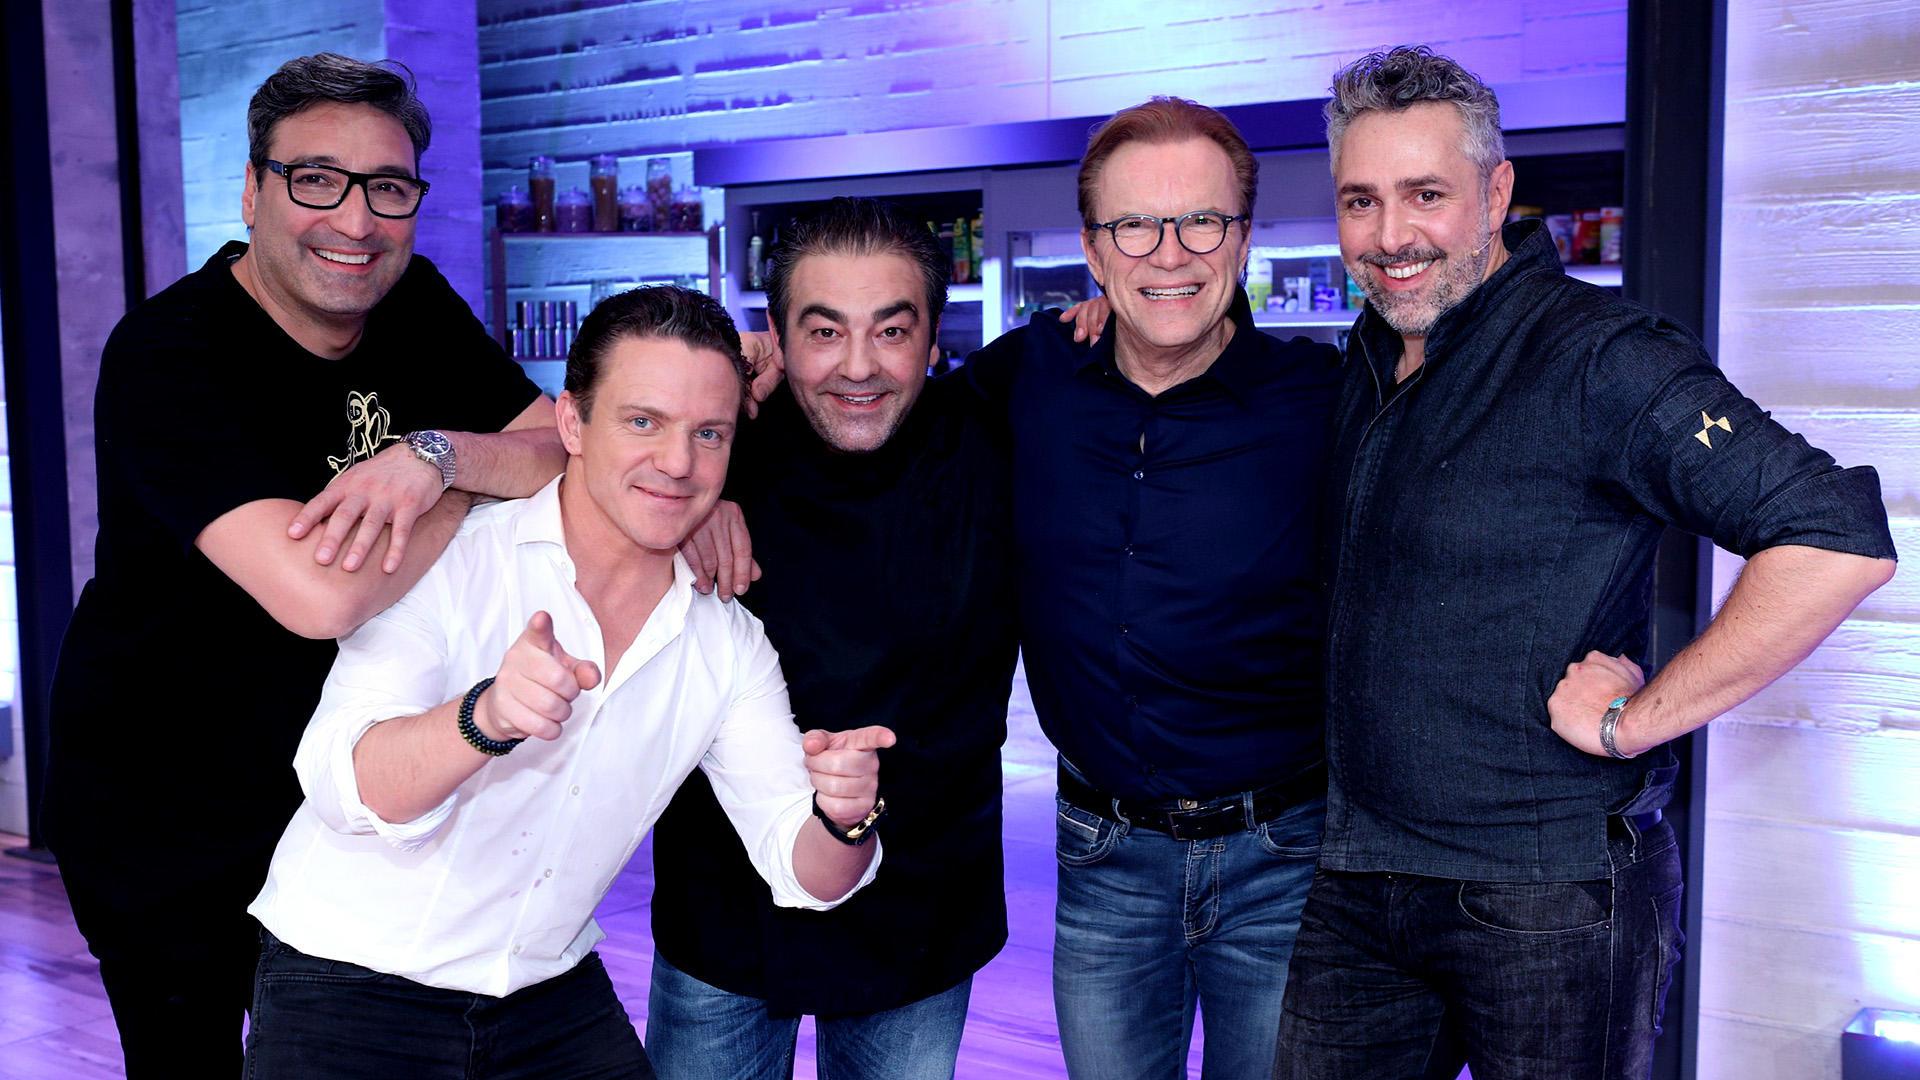 Mit Roland Trettl, Stefan Mross, Mousse T., Wolfgang Lippert | Folge 5